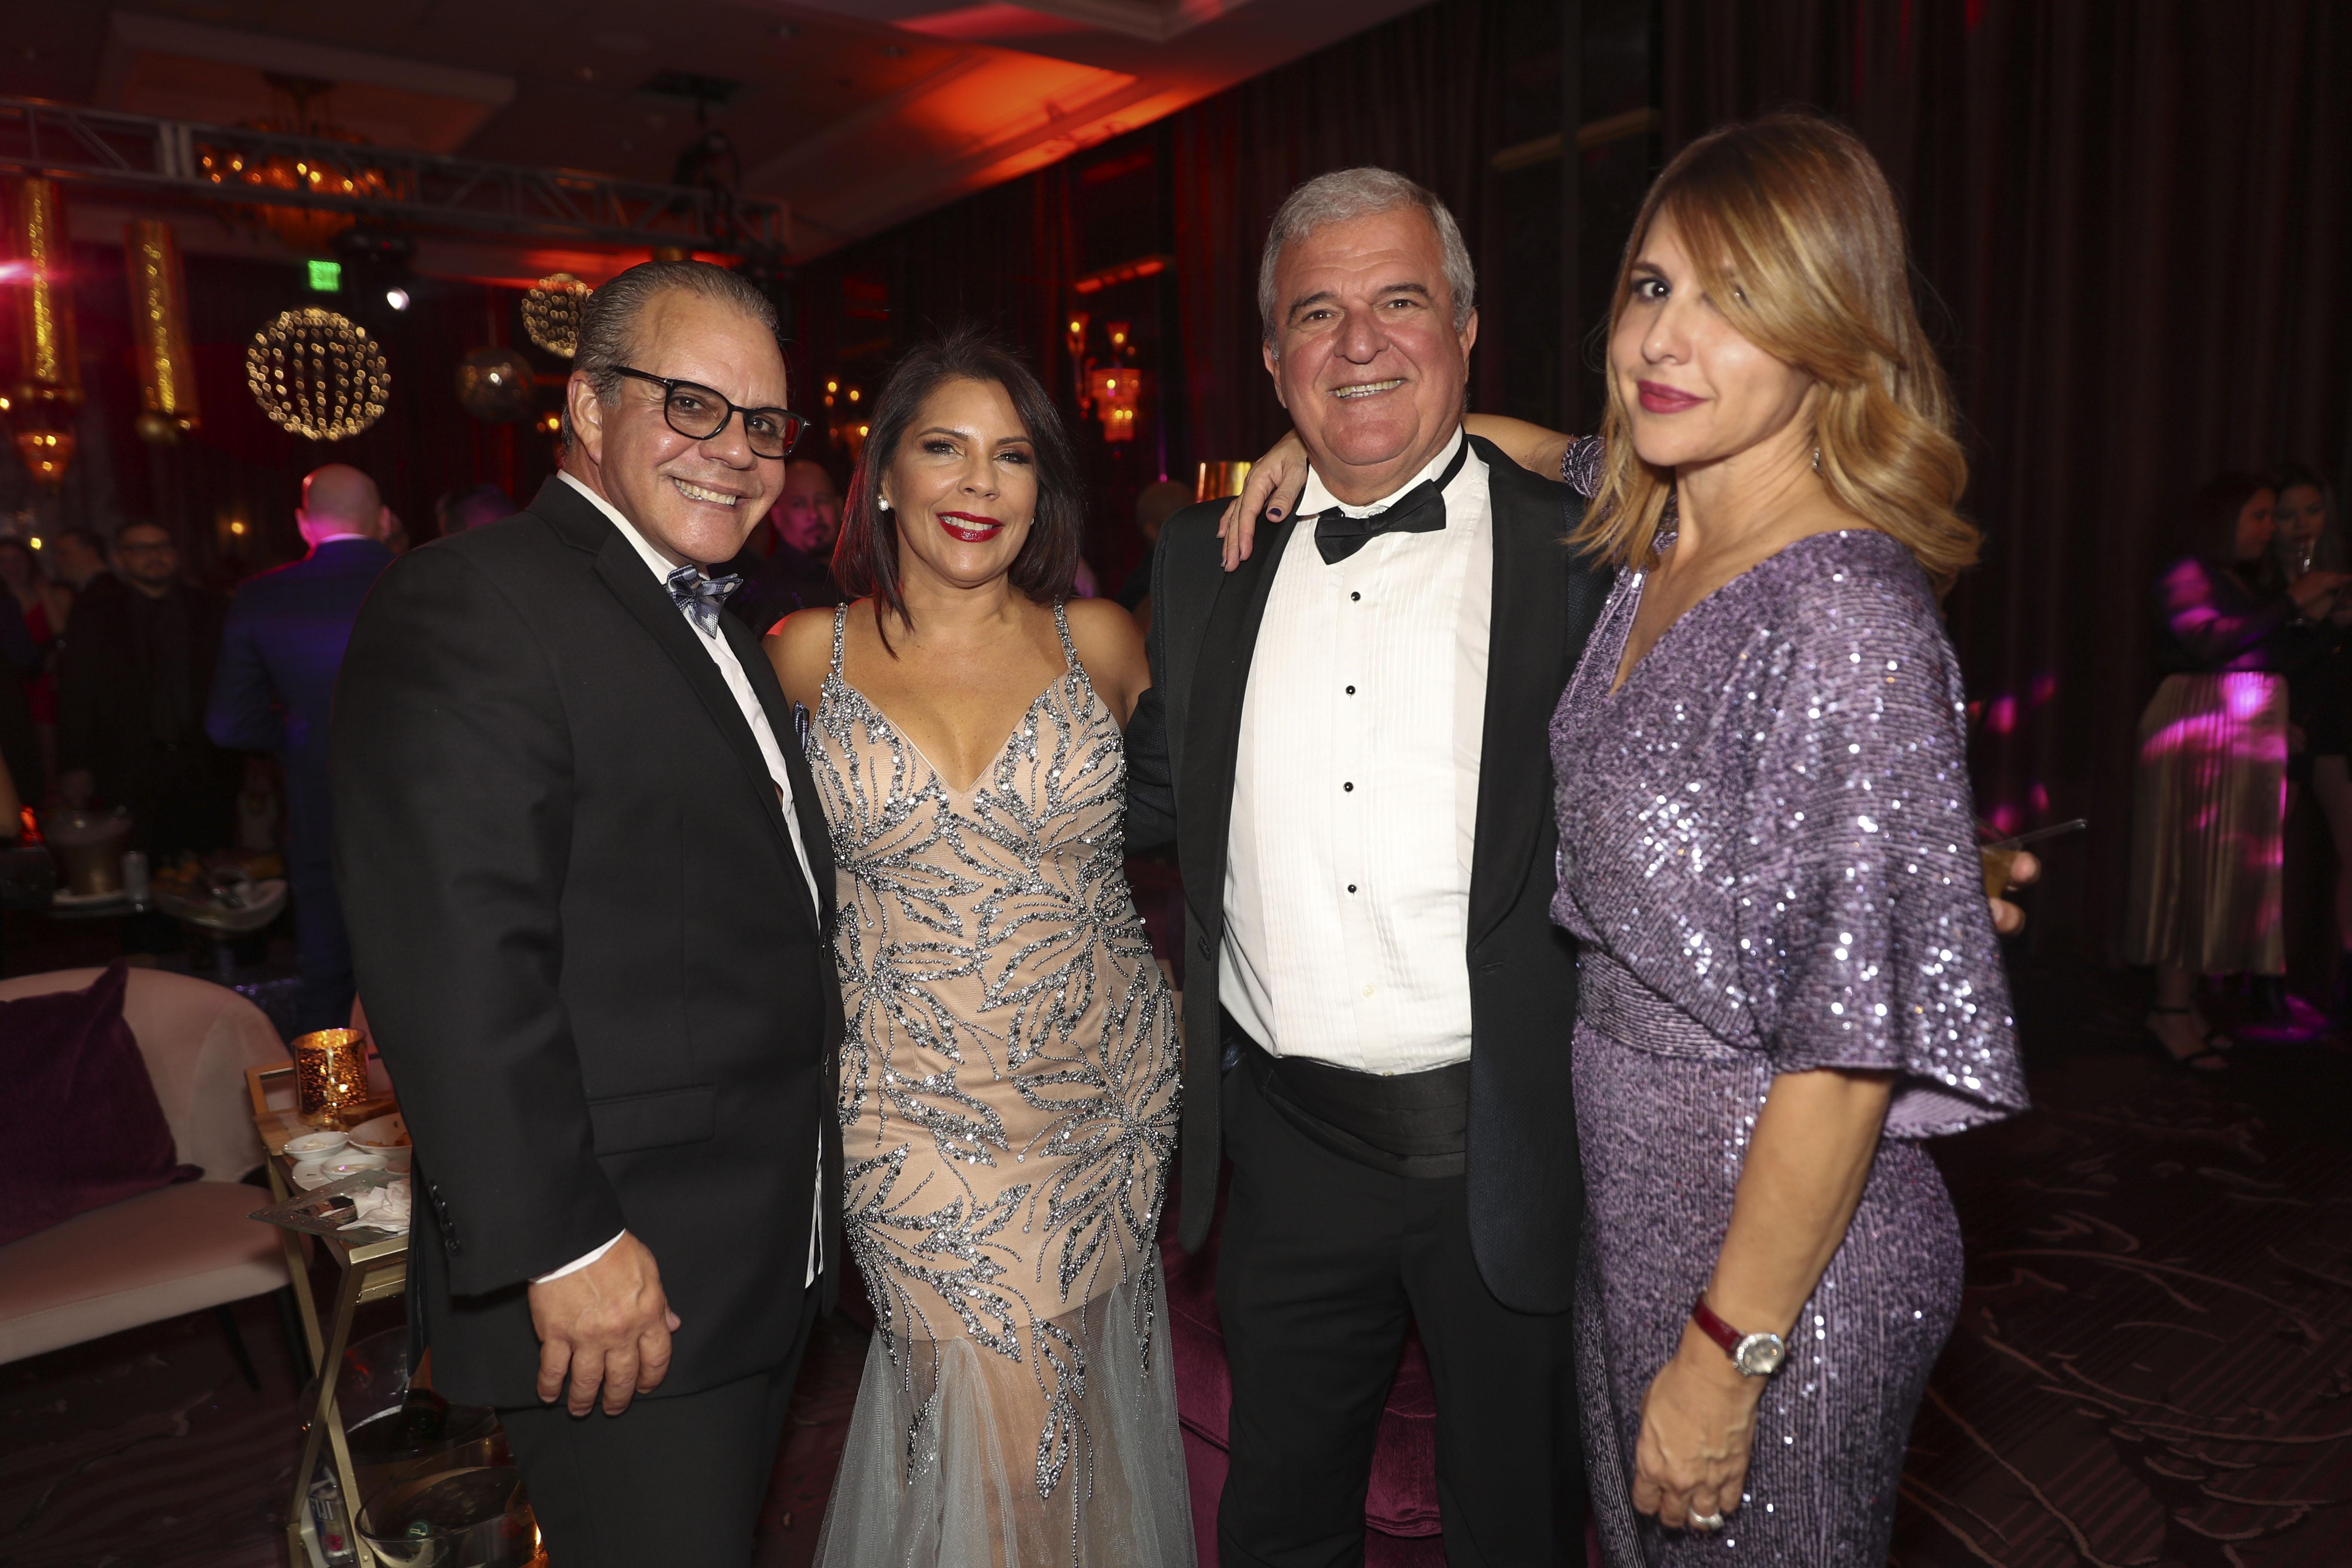 Axel Rocafort, Julia Vega, Pedro Tartak y Marie Arrieta. (Suministrada)